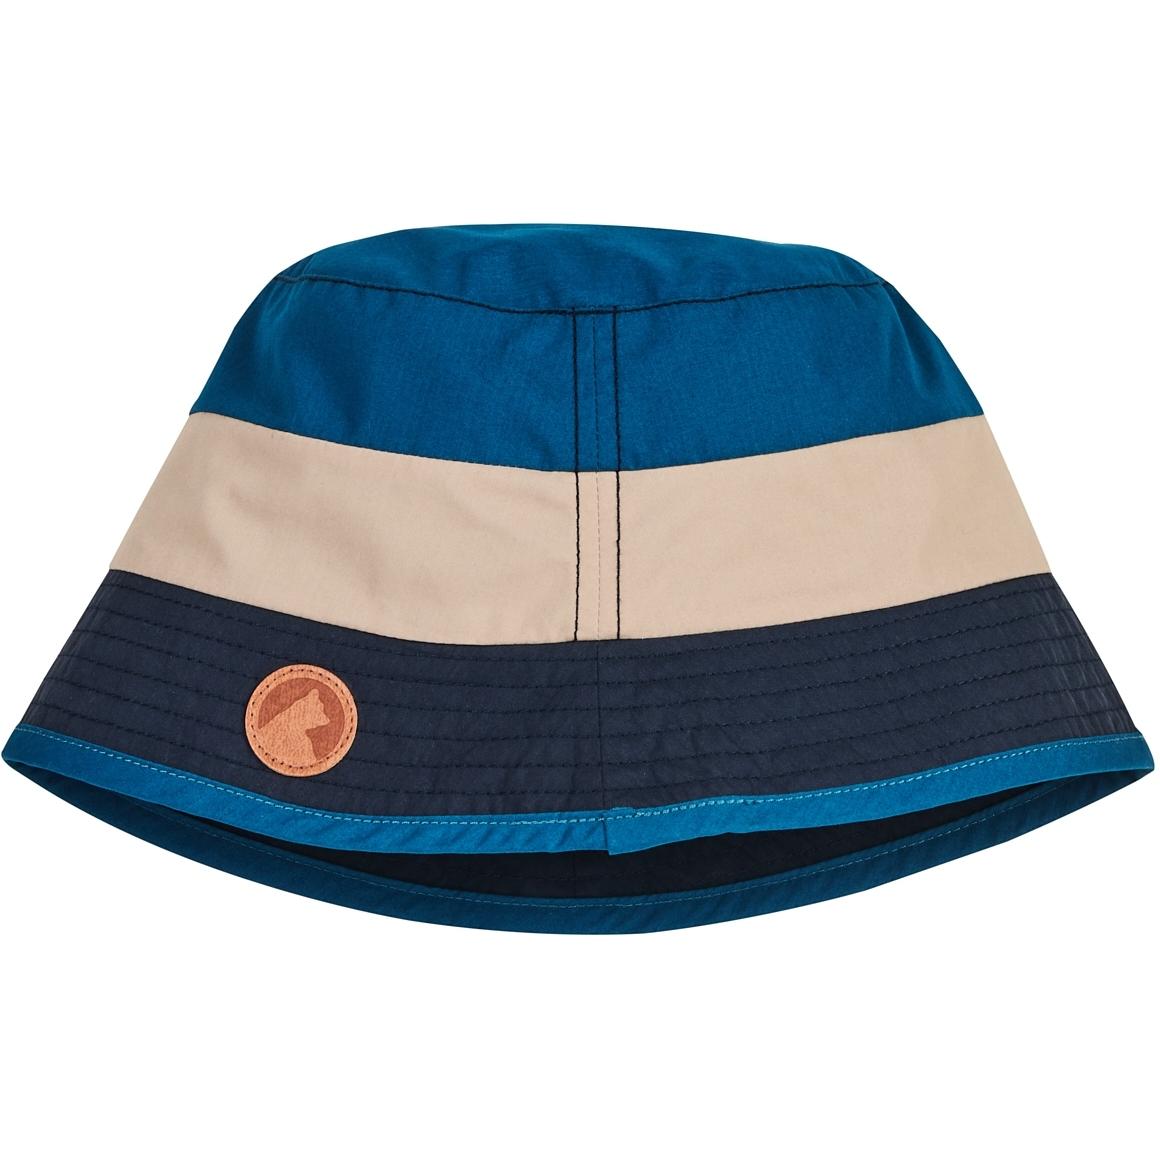 Picture of Finkid LASSE Kids Sun Hat - nautic/pebble